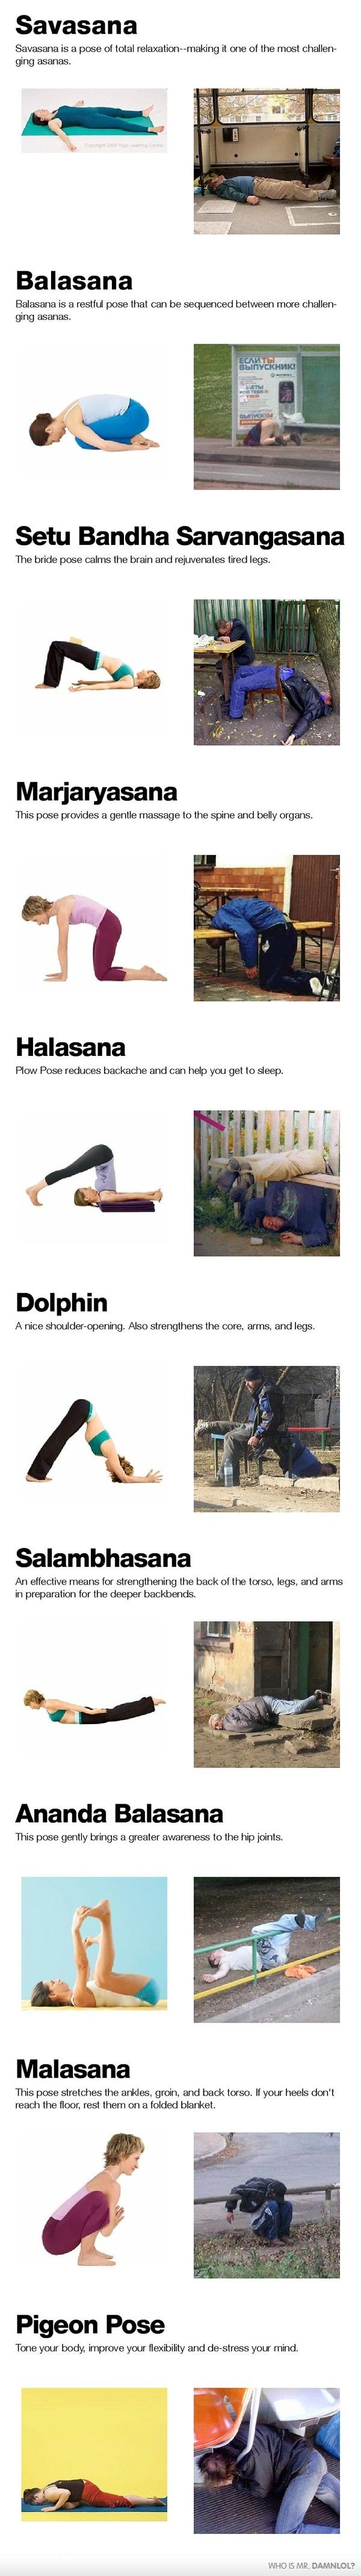 Yoga vs. Vodka: Fit, Laugh, Funny Pictures, Yoga Poses, Funny Stuff, Drunk Yoga, Humor, Vodka, Funny Yoga